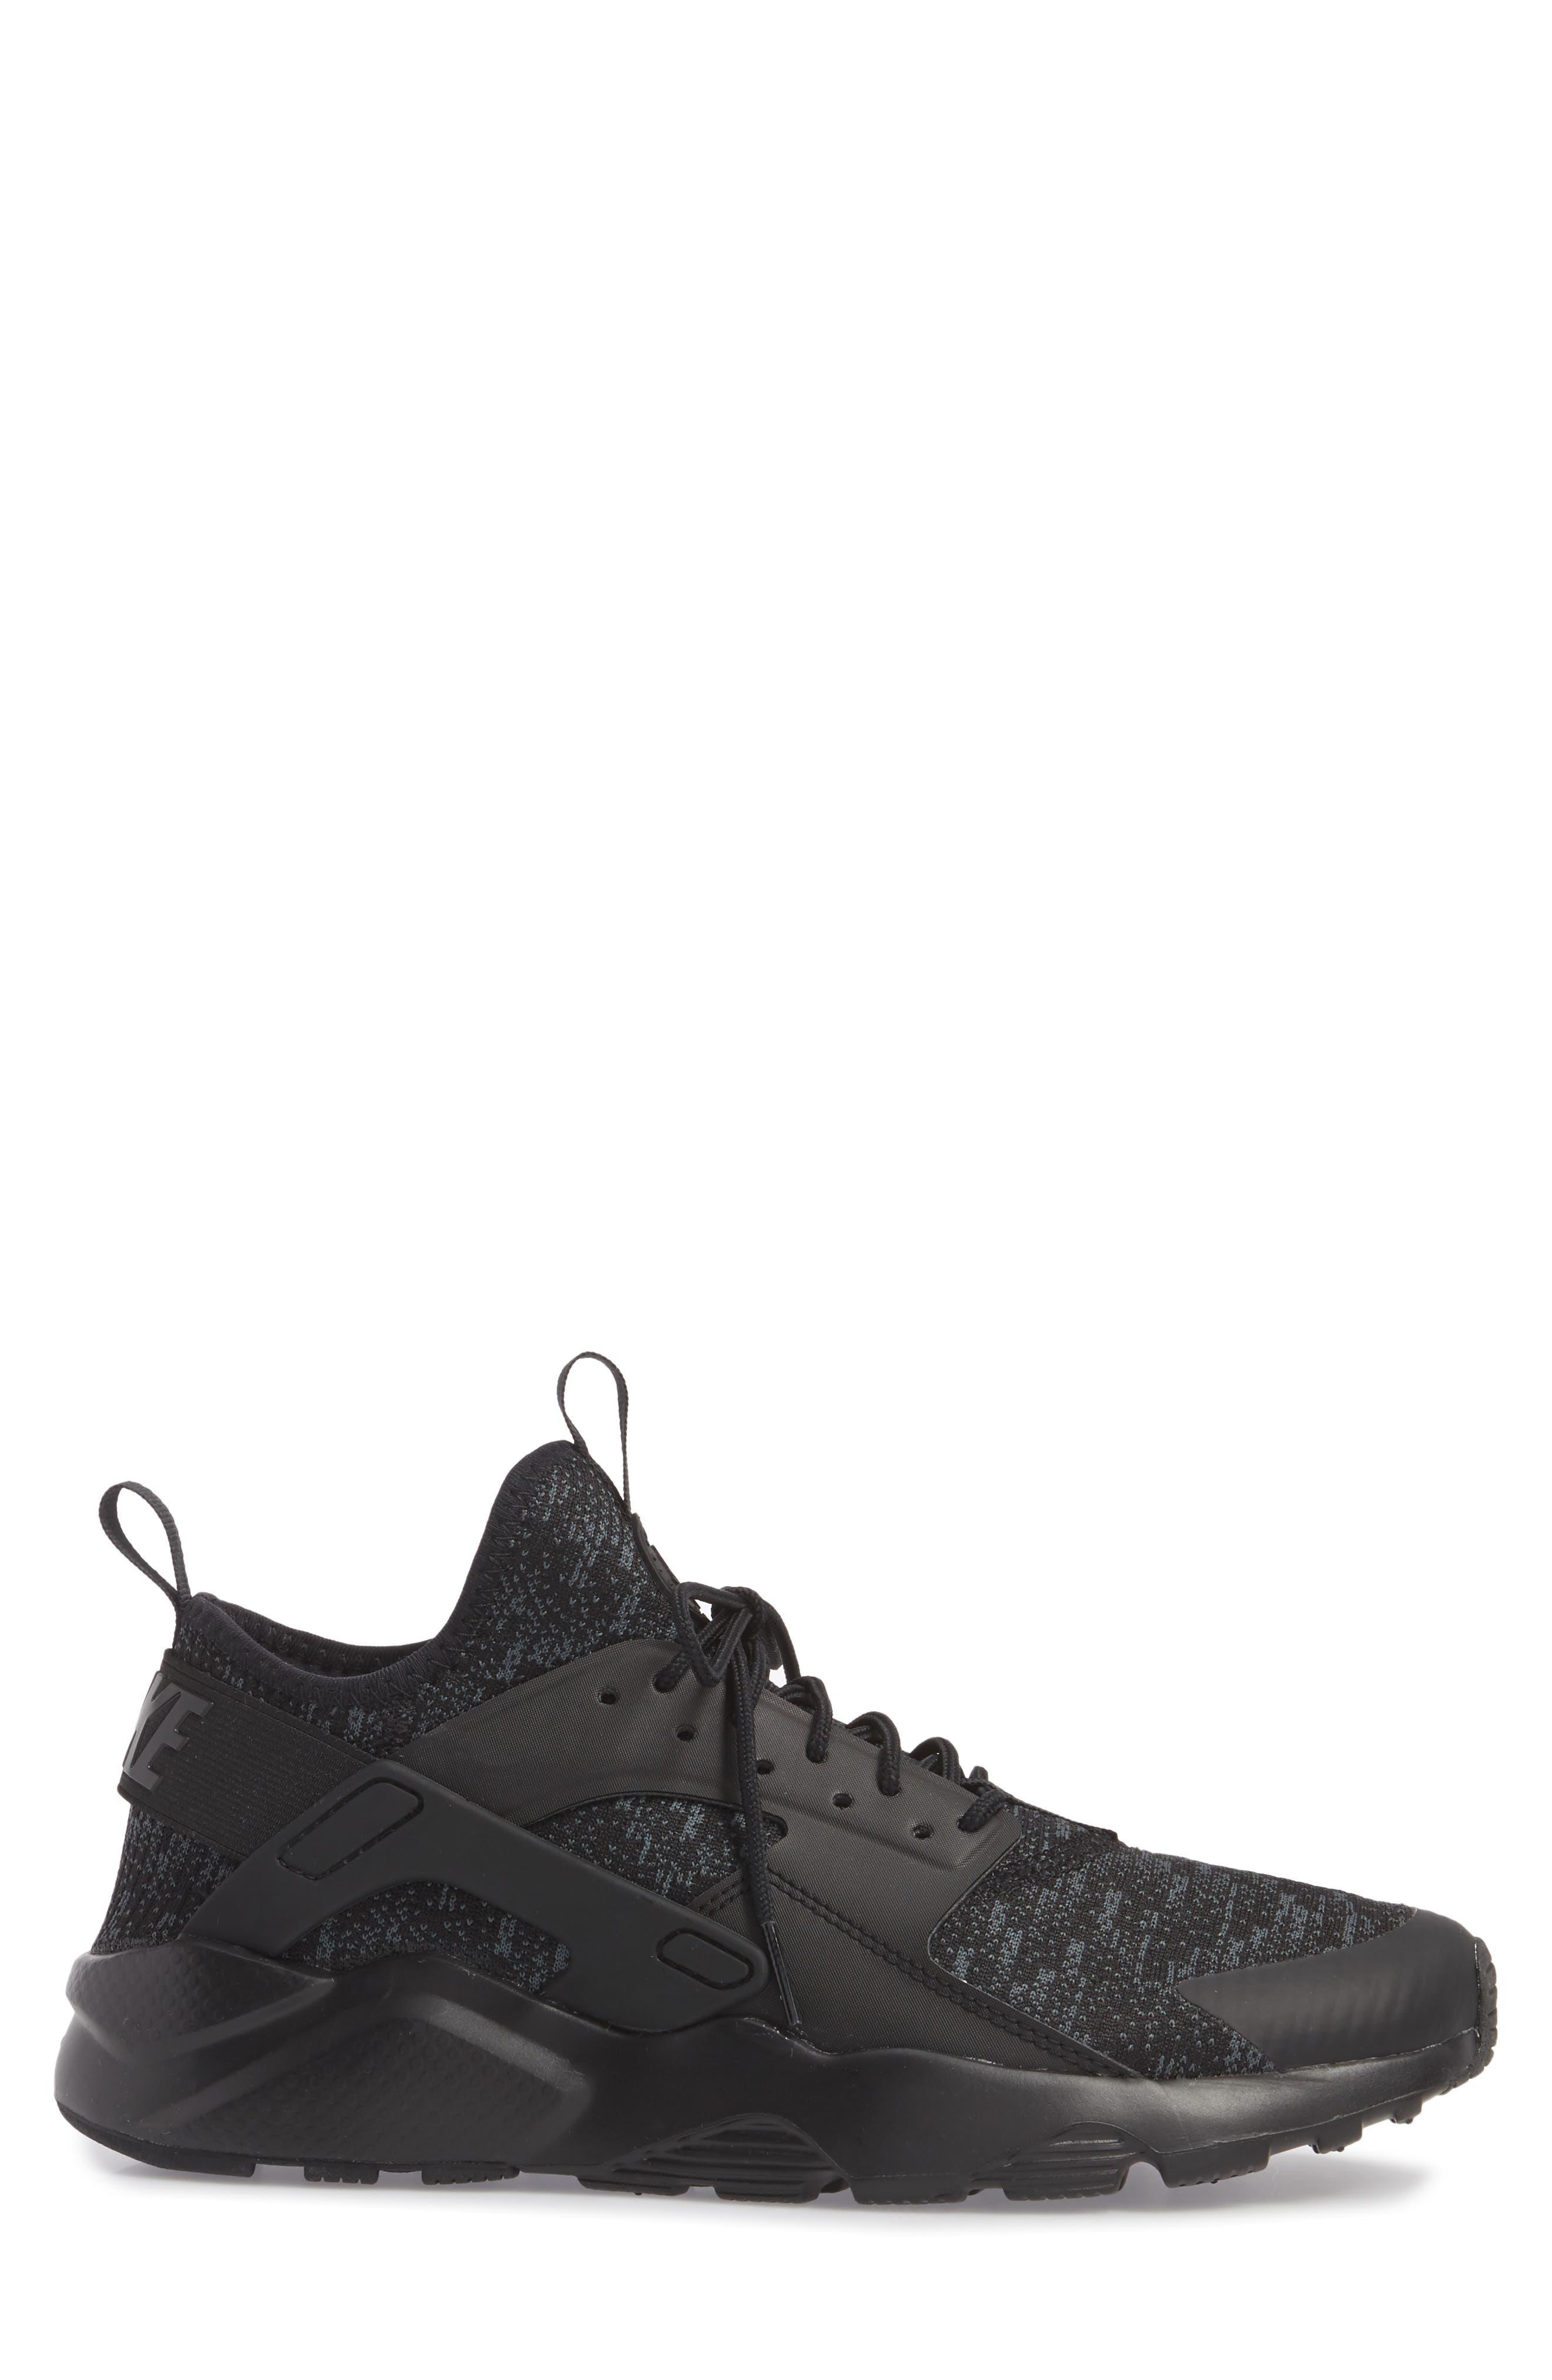 Air Huarache Run Ultra SE Sneaker,                             Alternate thumbnail 3, color,                             006